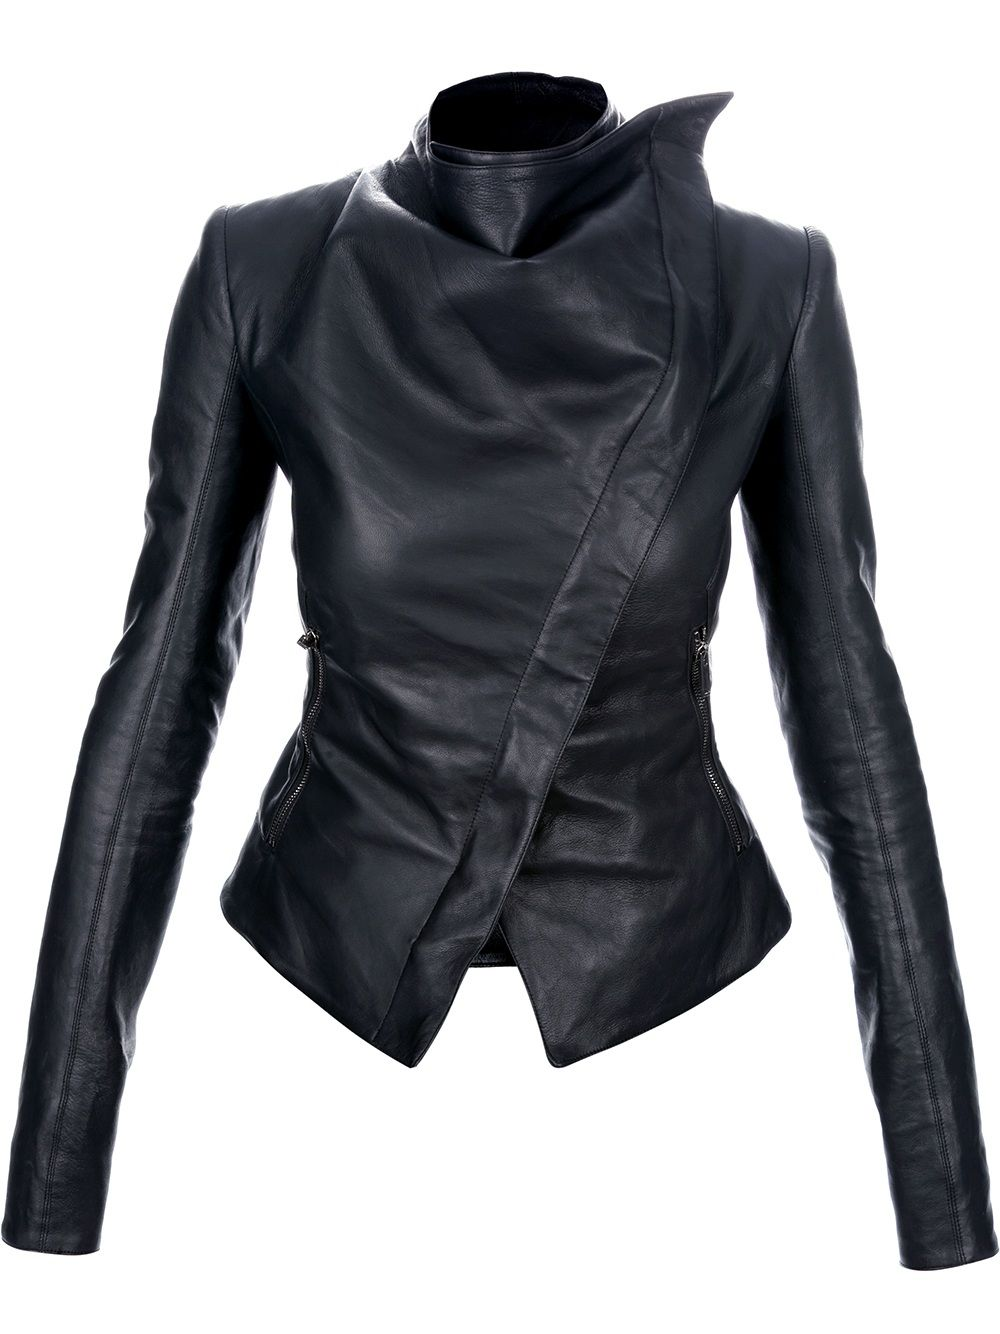 Gareth Pugh Asymmetric Leather Jacket Farfetch Com Designer Leather Jackets Fashion Leather Jacket [ 1334 x 1000 Pixel ]